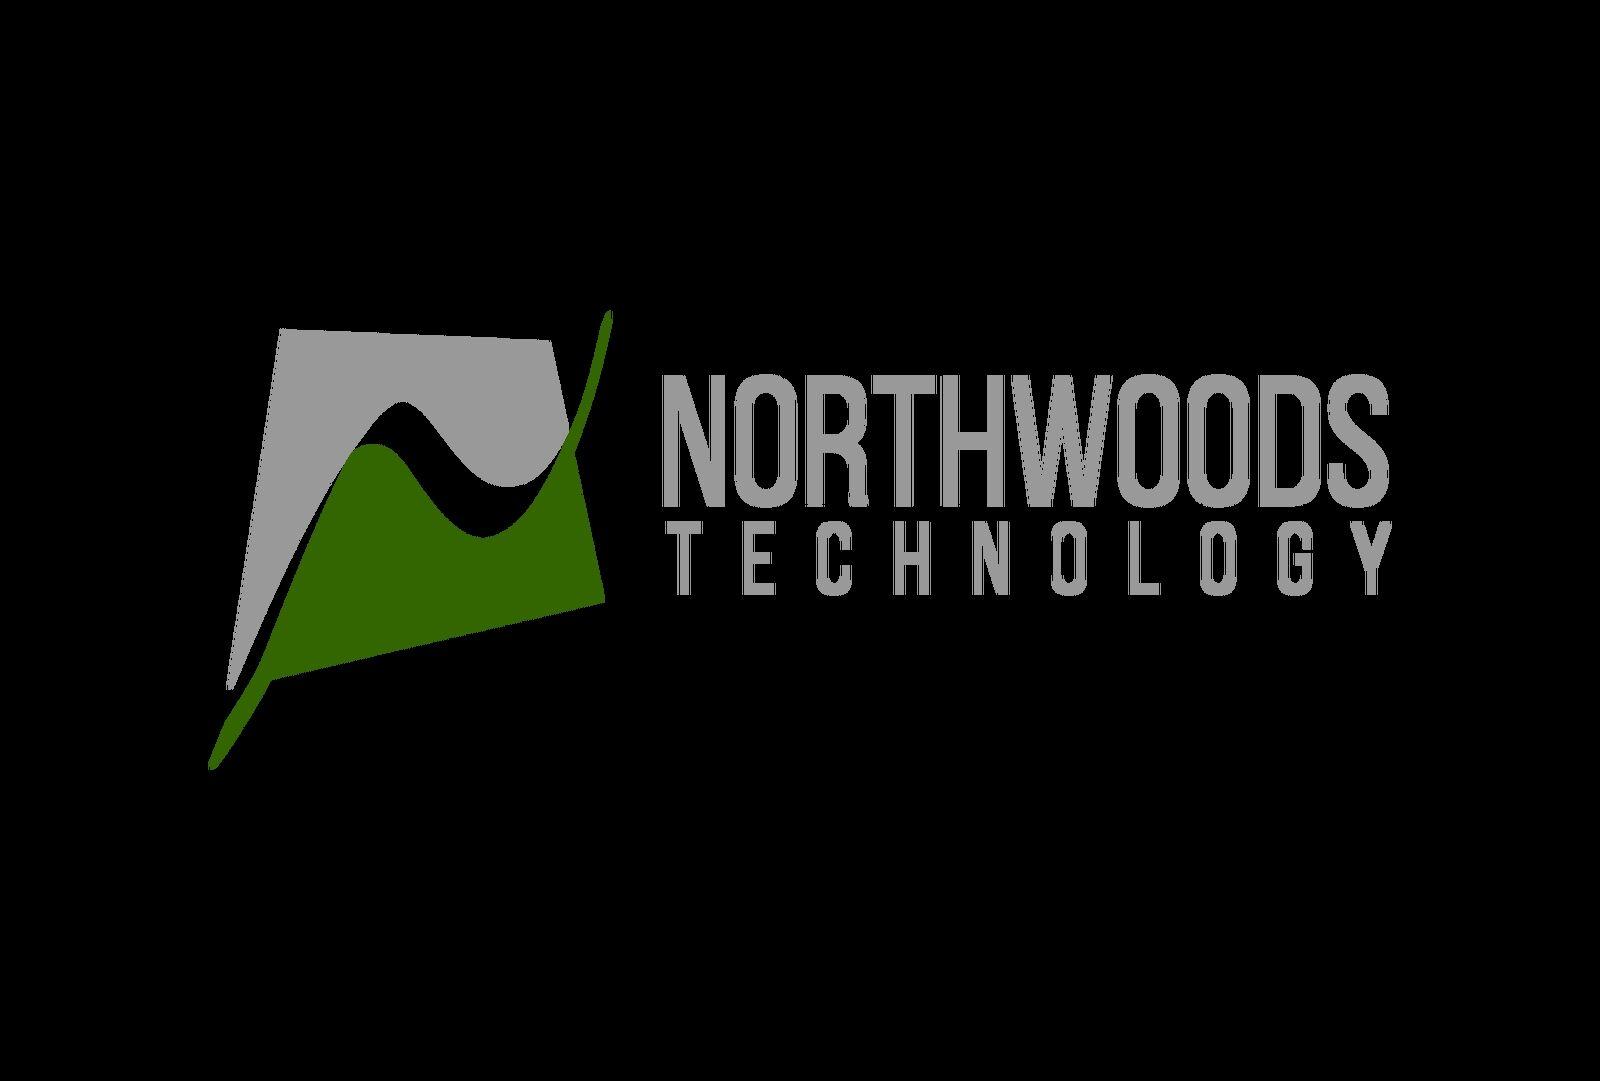 Northwoods Technology